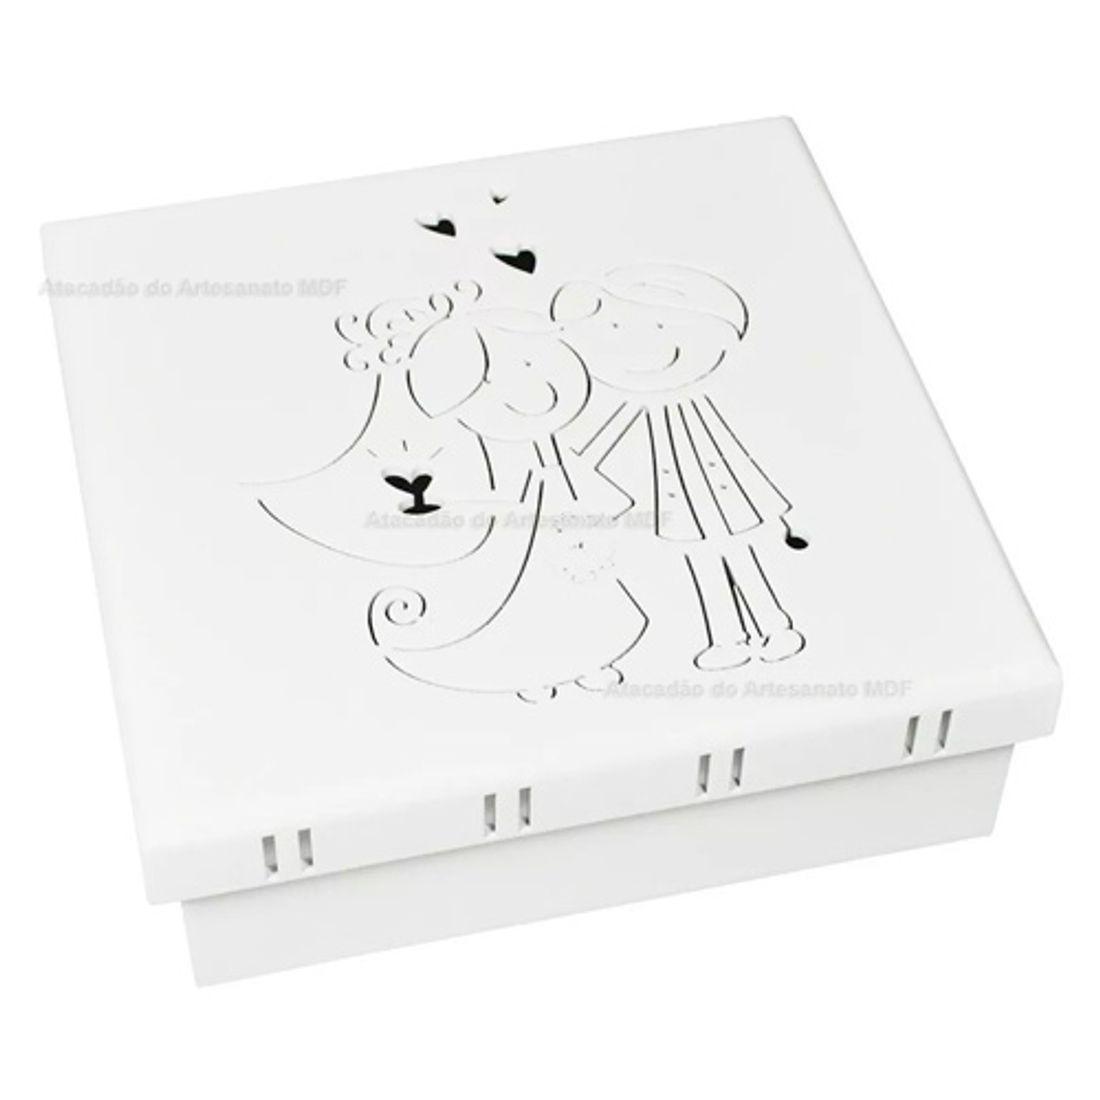 Caixa-Noivos-Desenhado-Passa-Fita-Pintado-15x15x55-Mdf